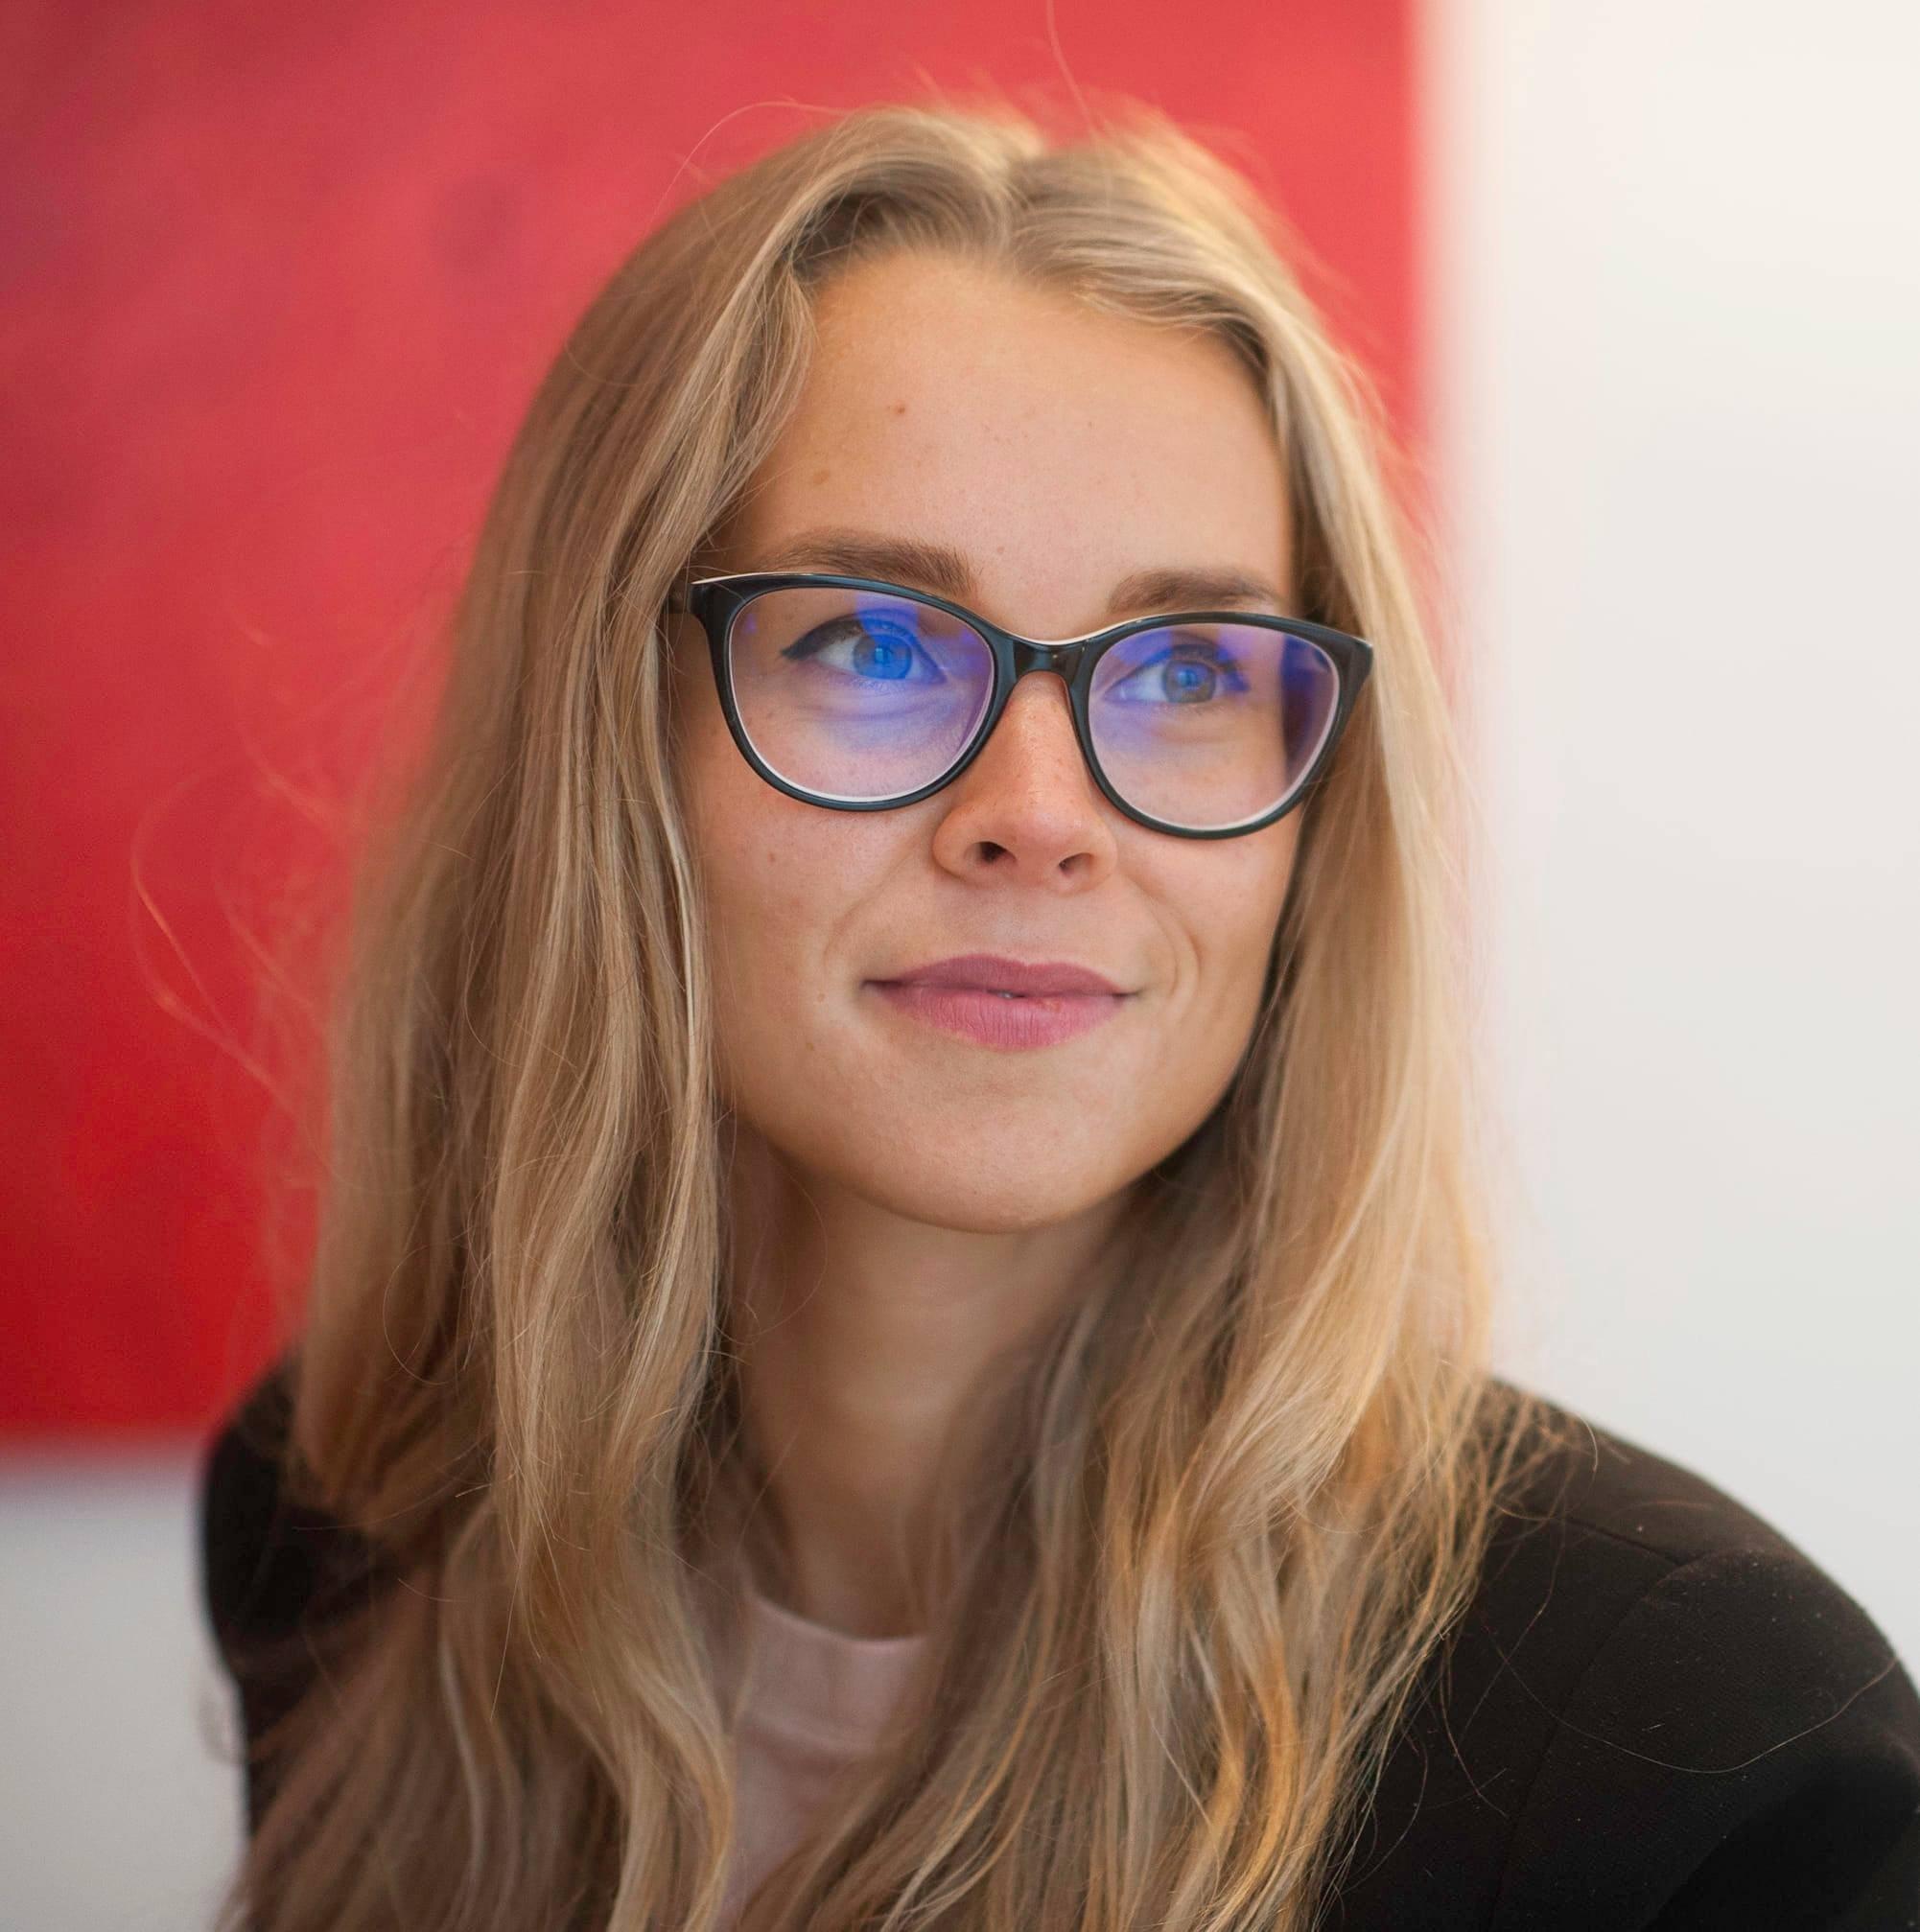 Anita Lotze